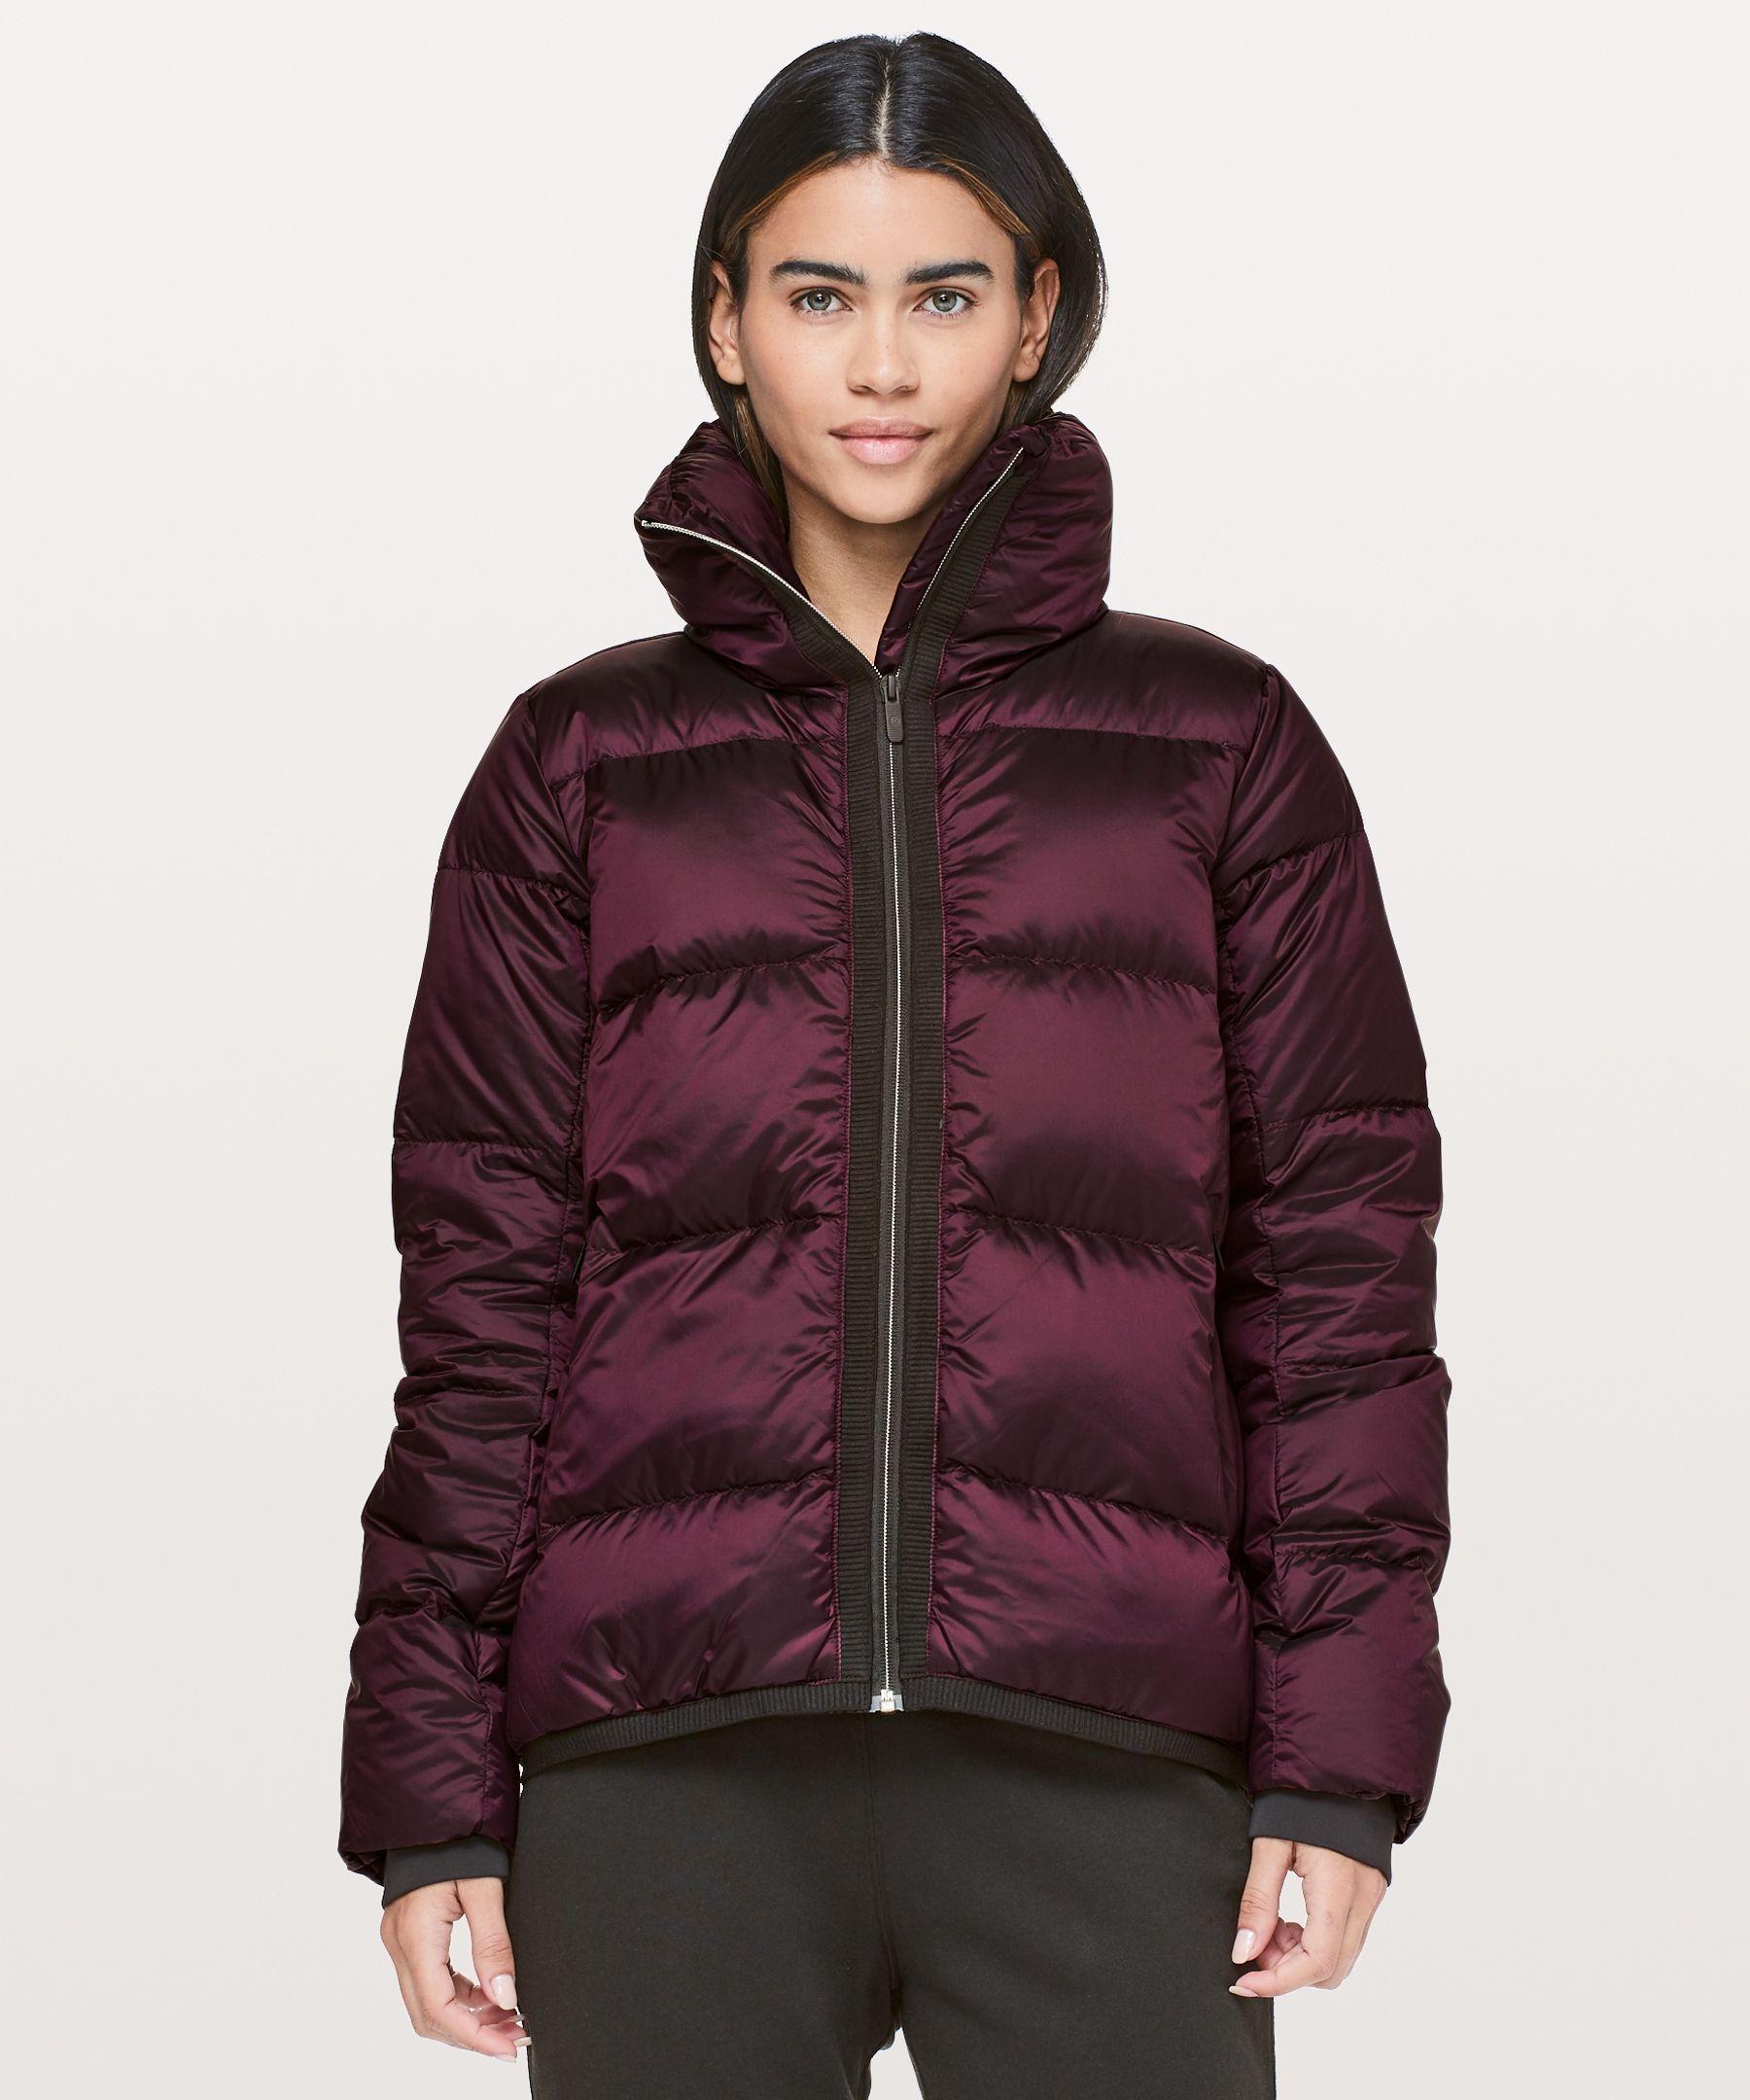 Dark Adobe Sports Jackets Women Jackets Stylish Winter Coats [ 2160 x 1800 Pixel ]